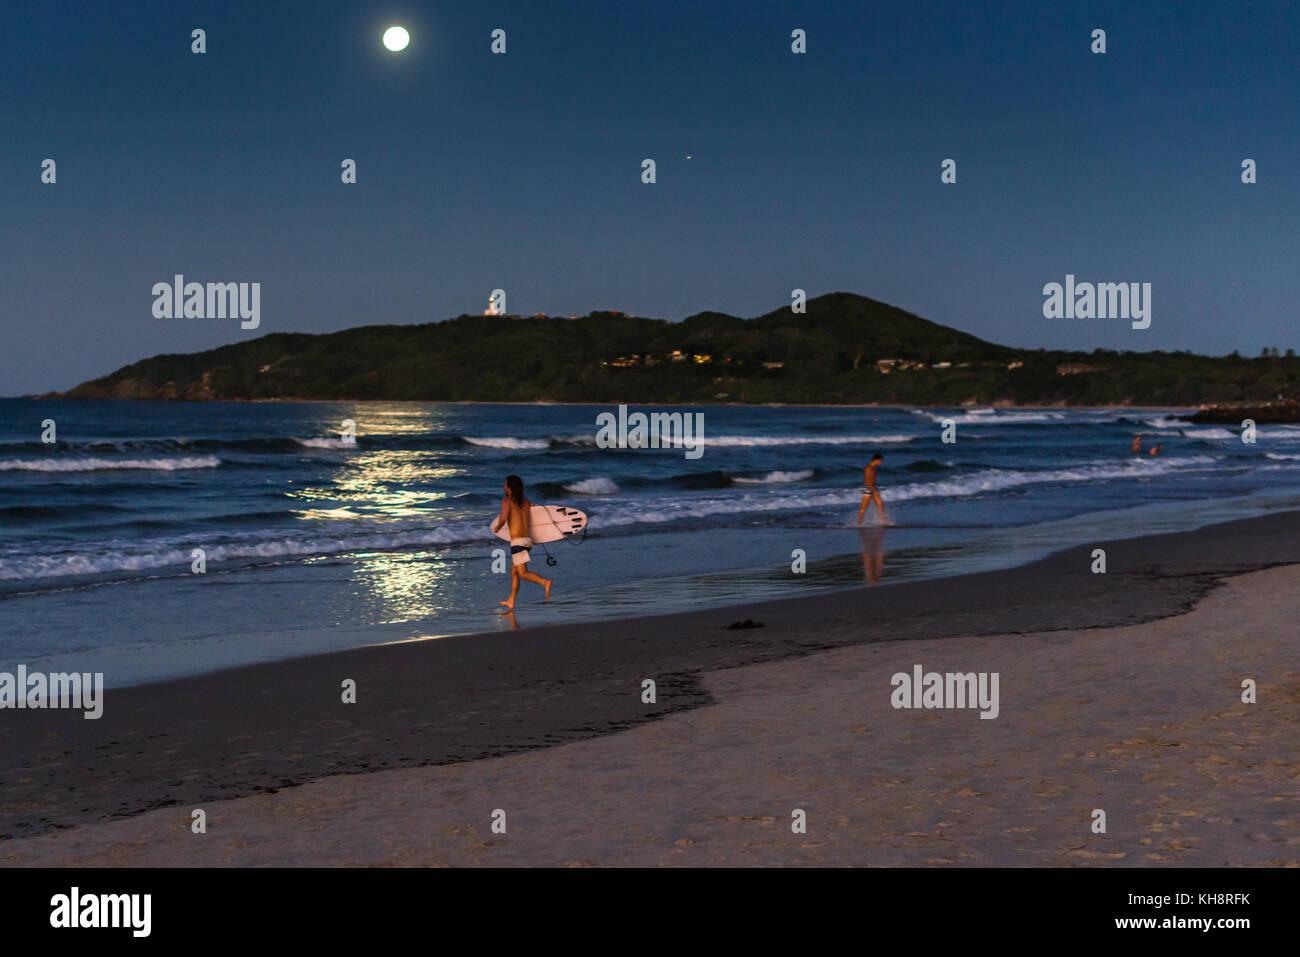 Surfing by moonlight on Belongil beach, Cape Byron Bay, New South Wales, Australia. - Stock Image